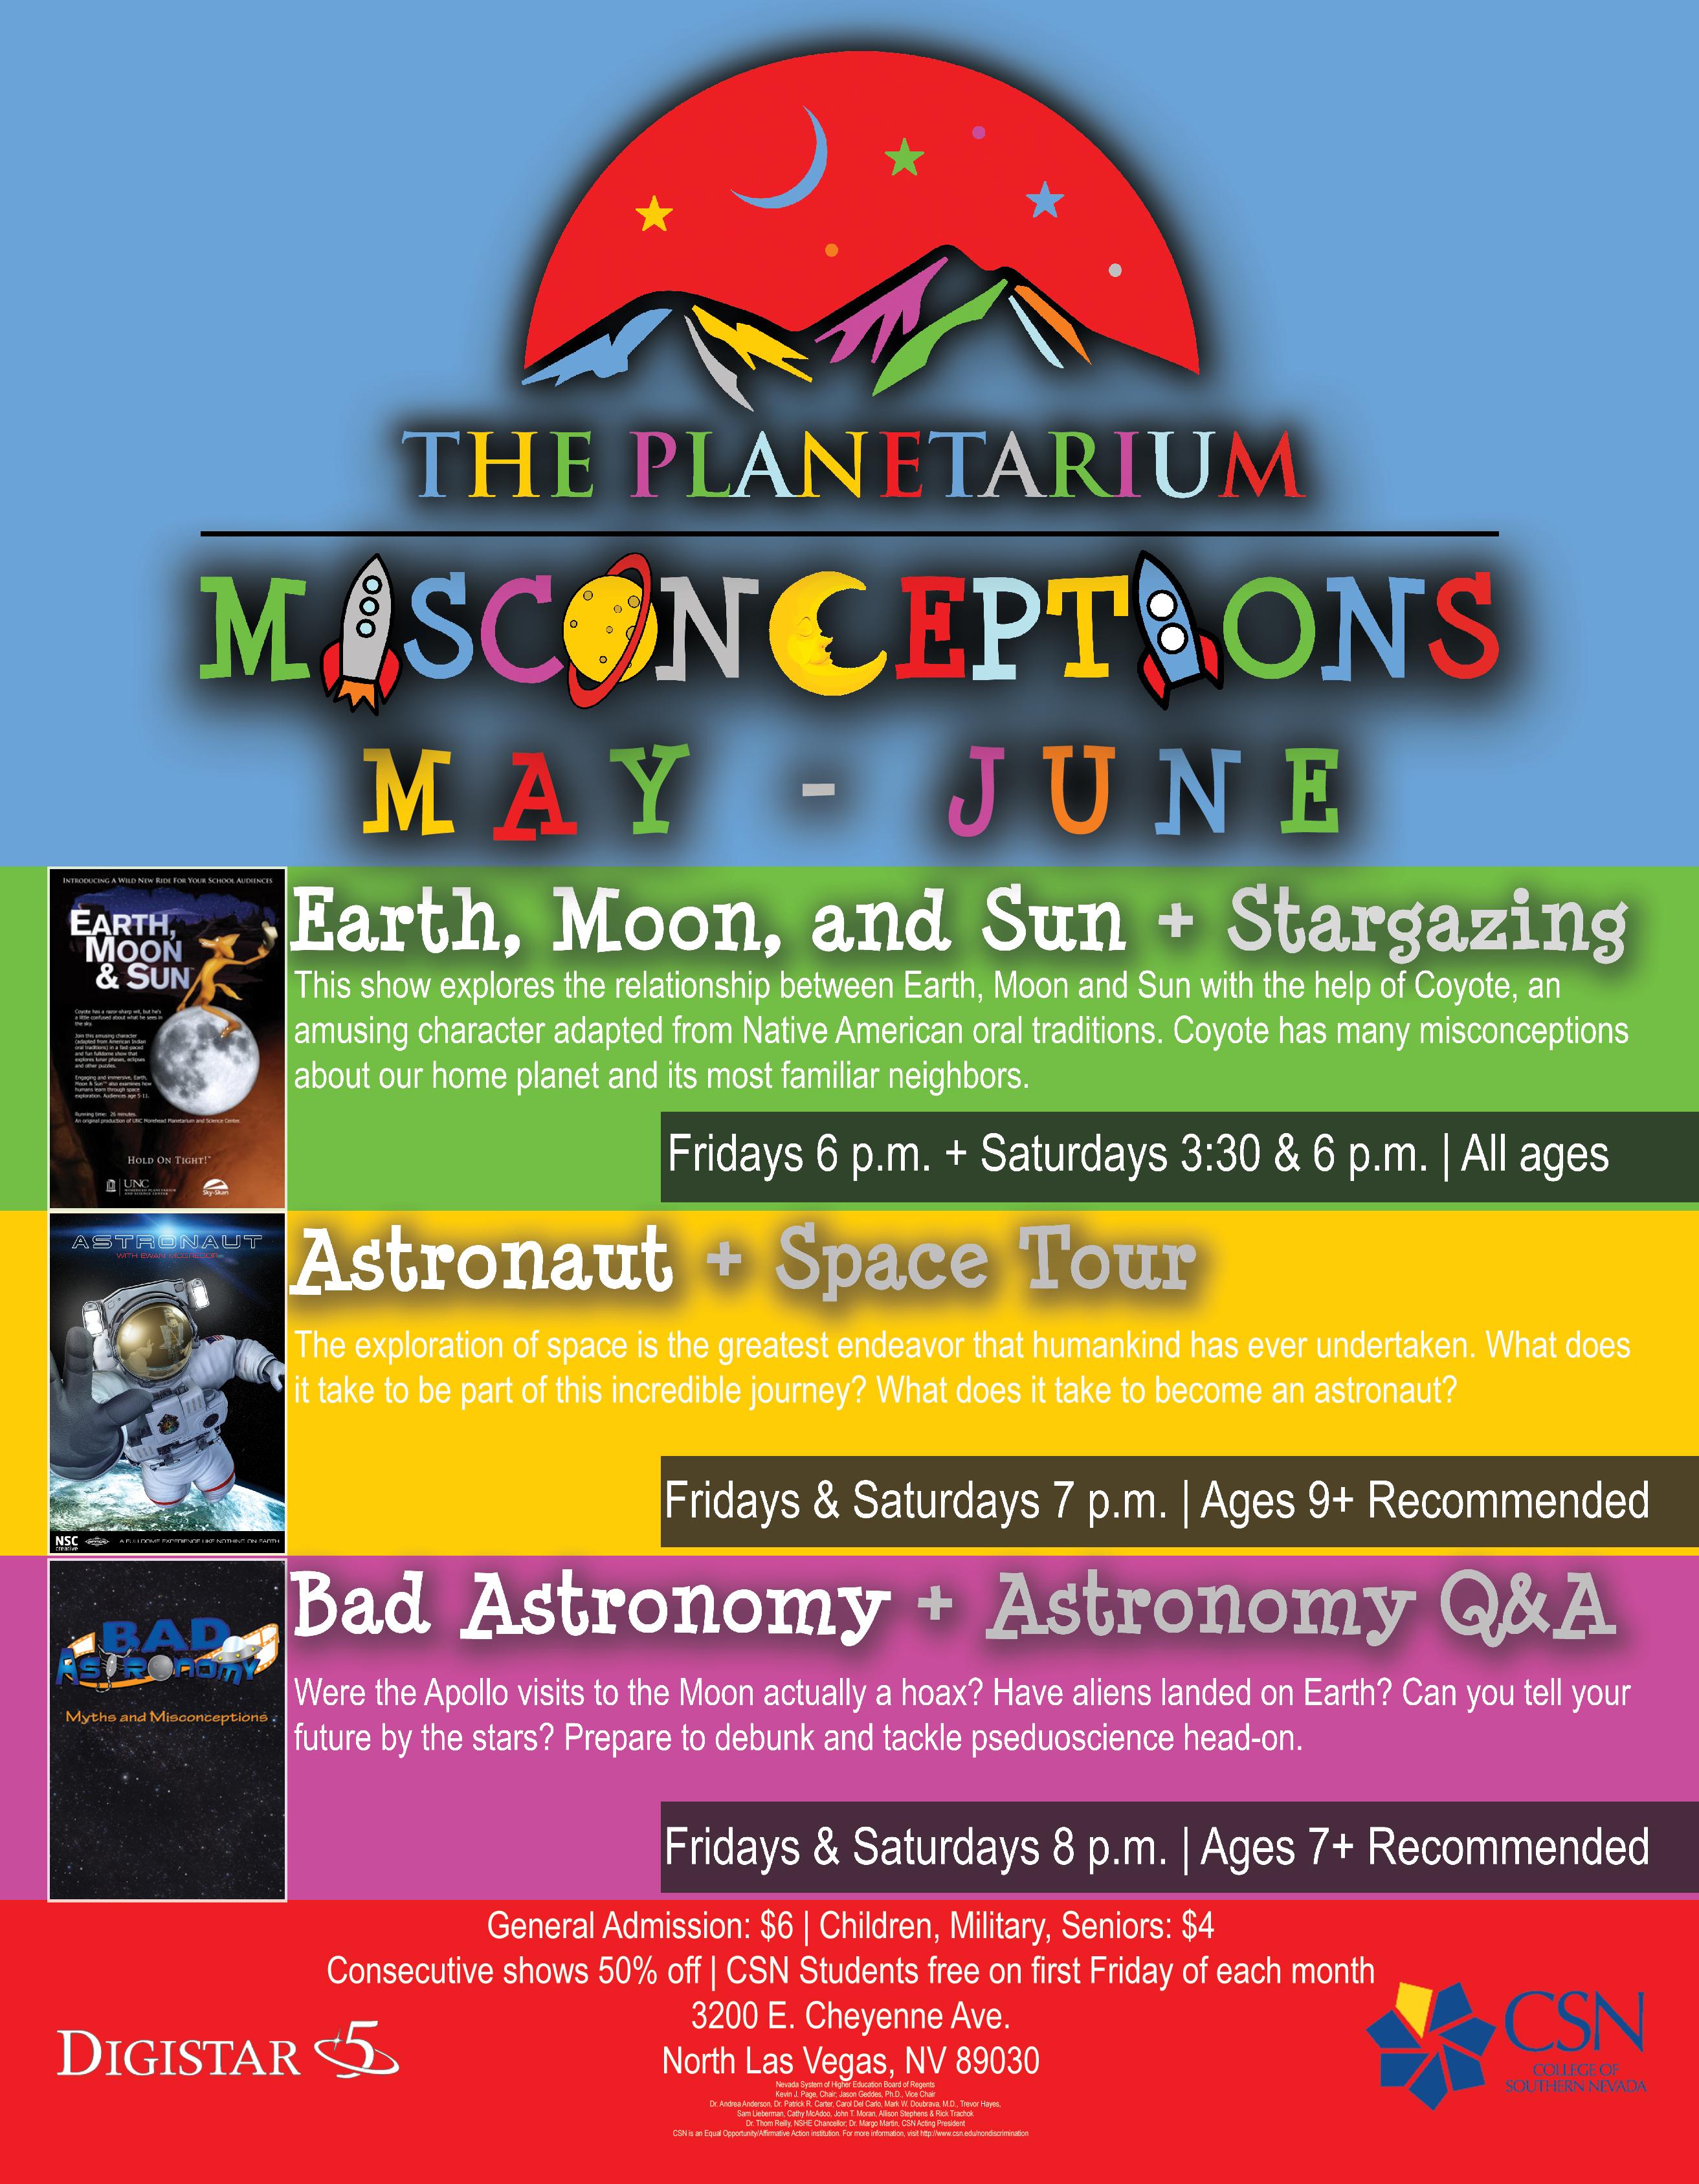 May through June Planetarium Schedule Flyer